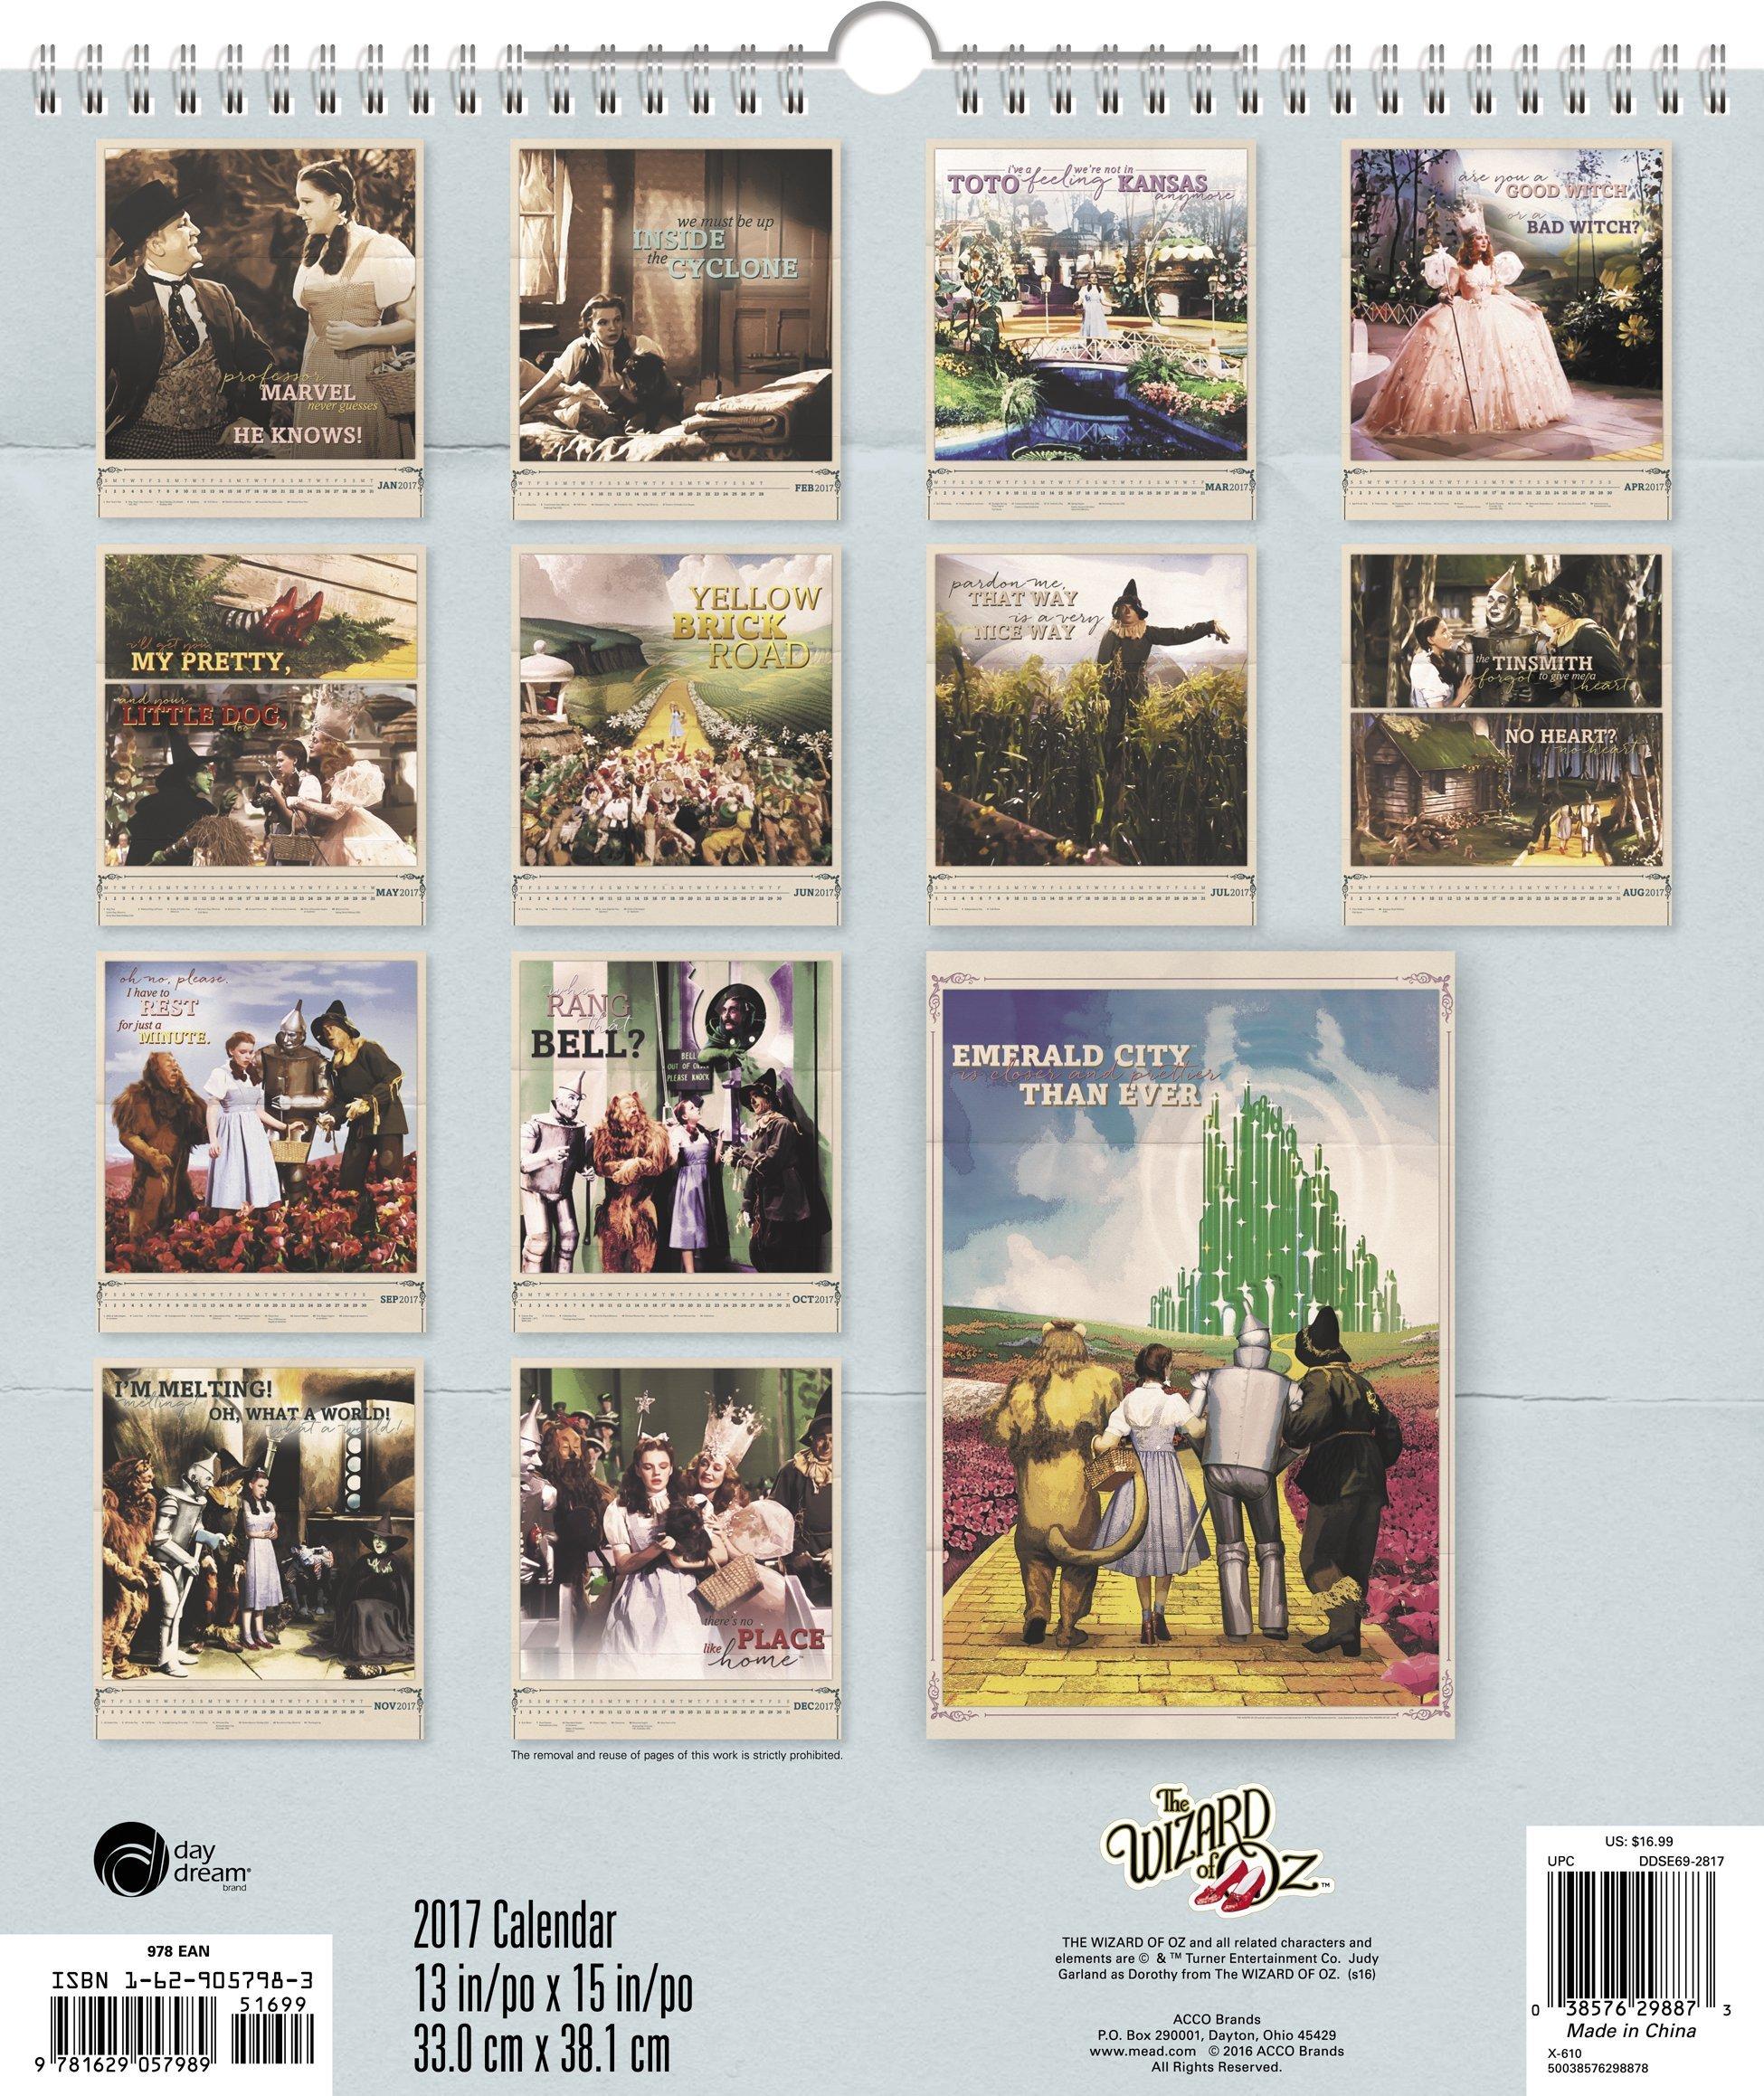 the wizard of oz wall calendar 2017 day dream 0038576298873